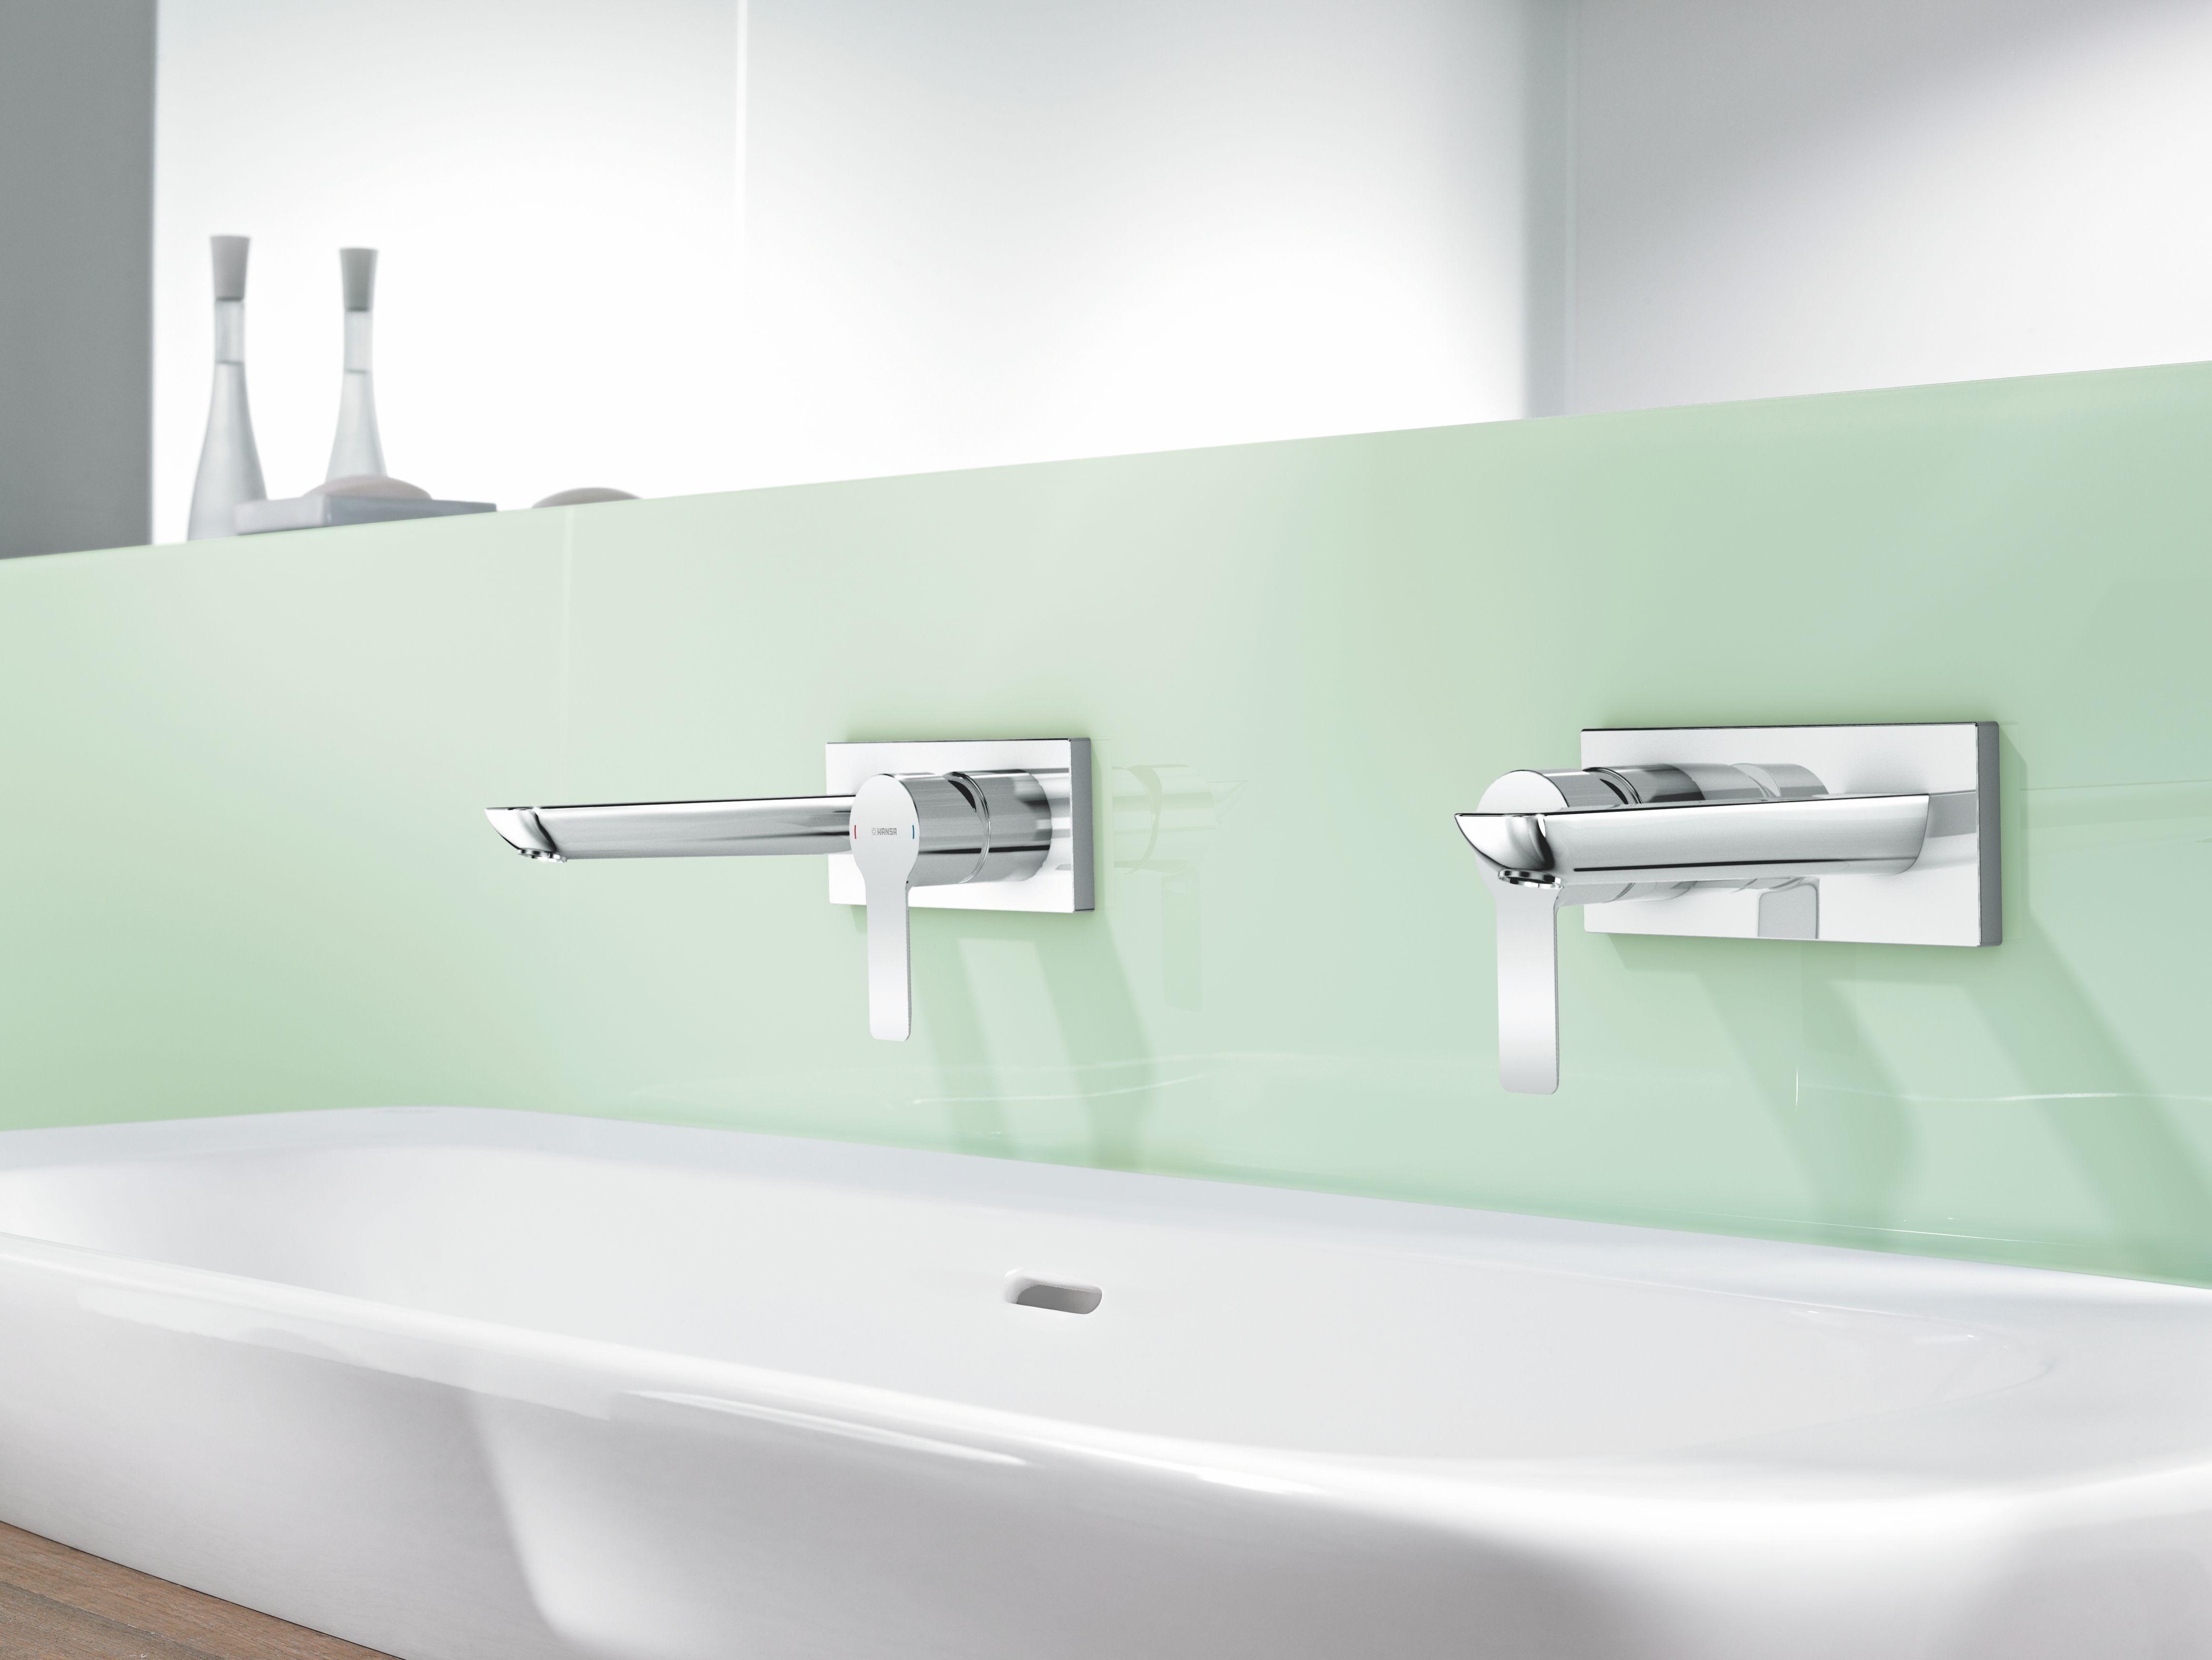 Badkameropstelling badmeubel badkamer inspiratie for Badkamer kraan